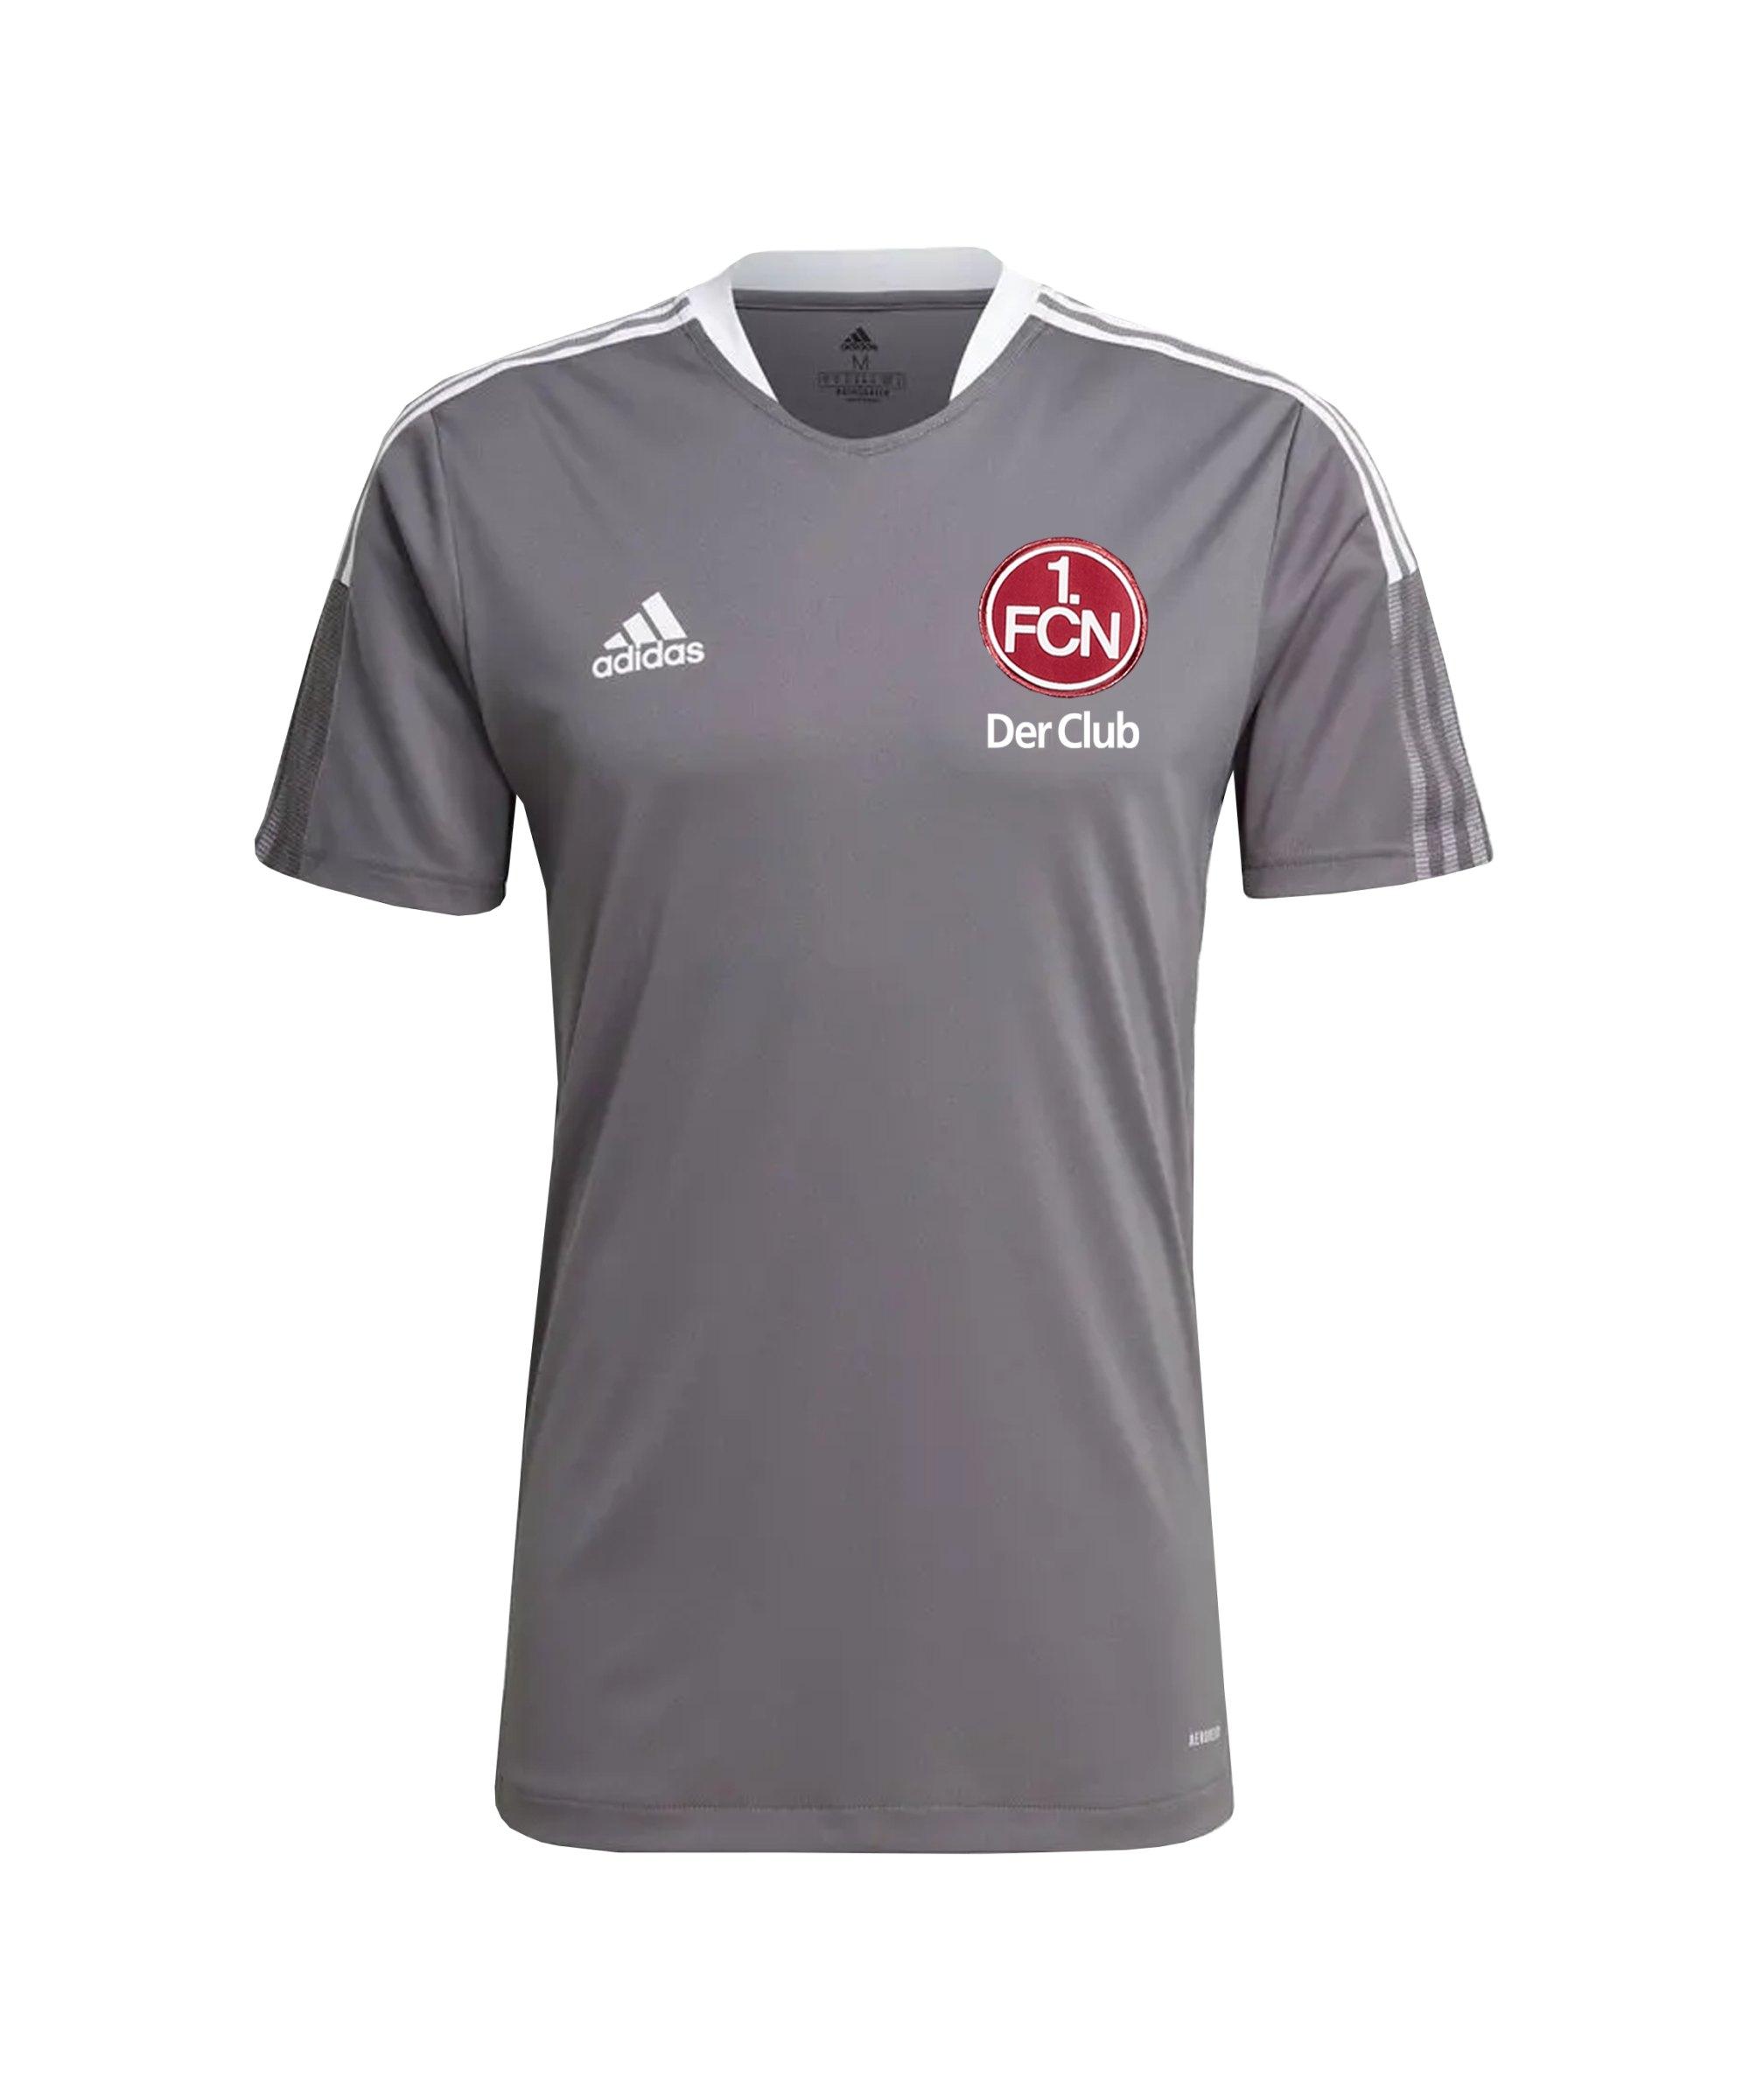 adidas 1. FC Nürnberg Trainingsshirt Kids Grau - grau